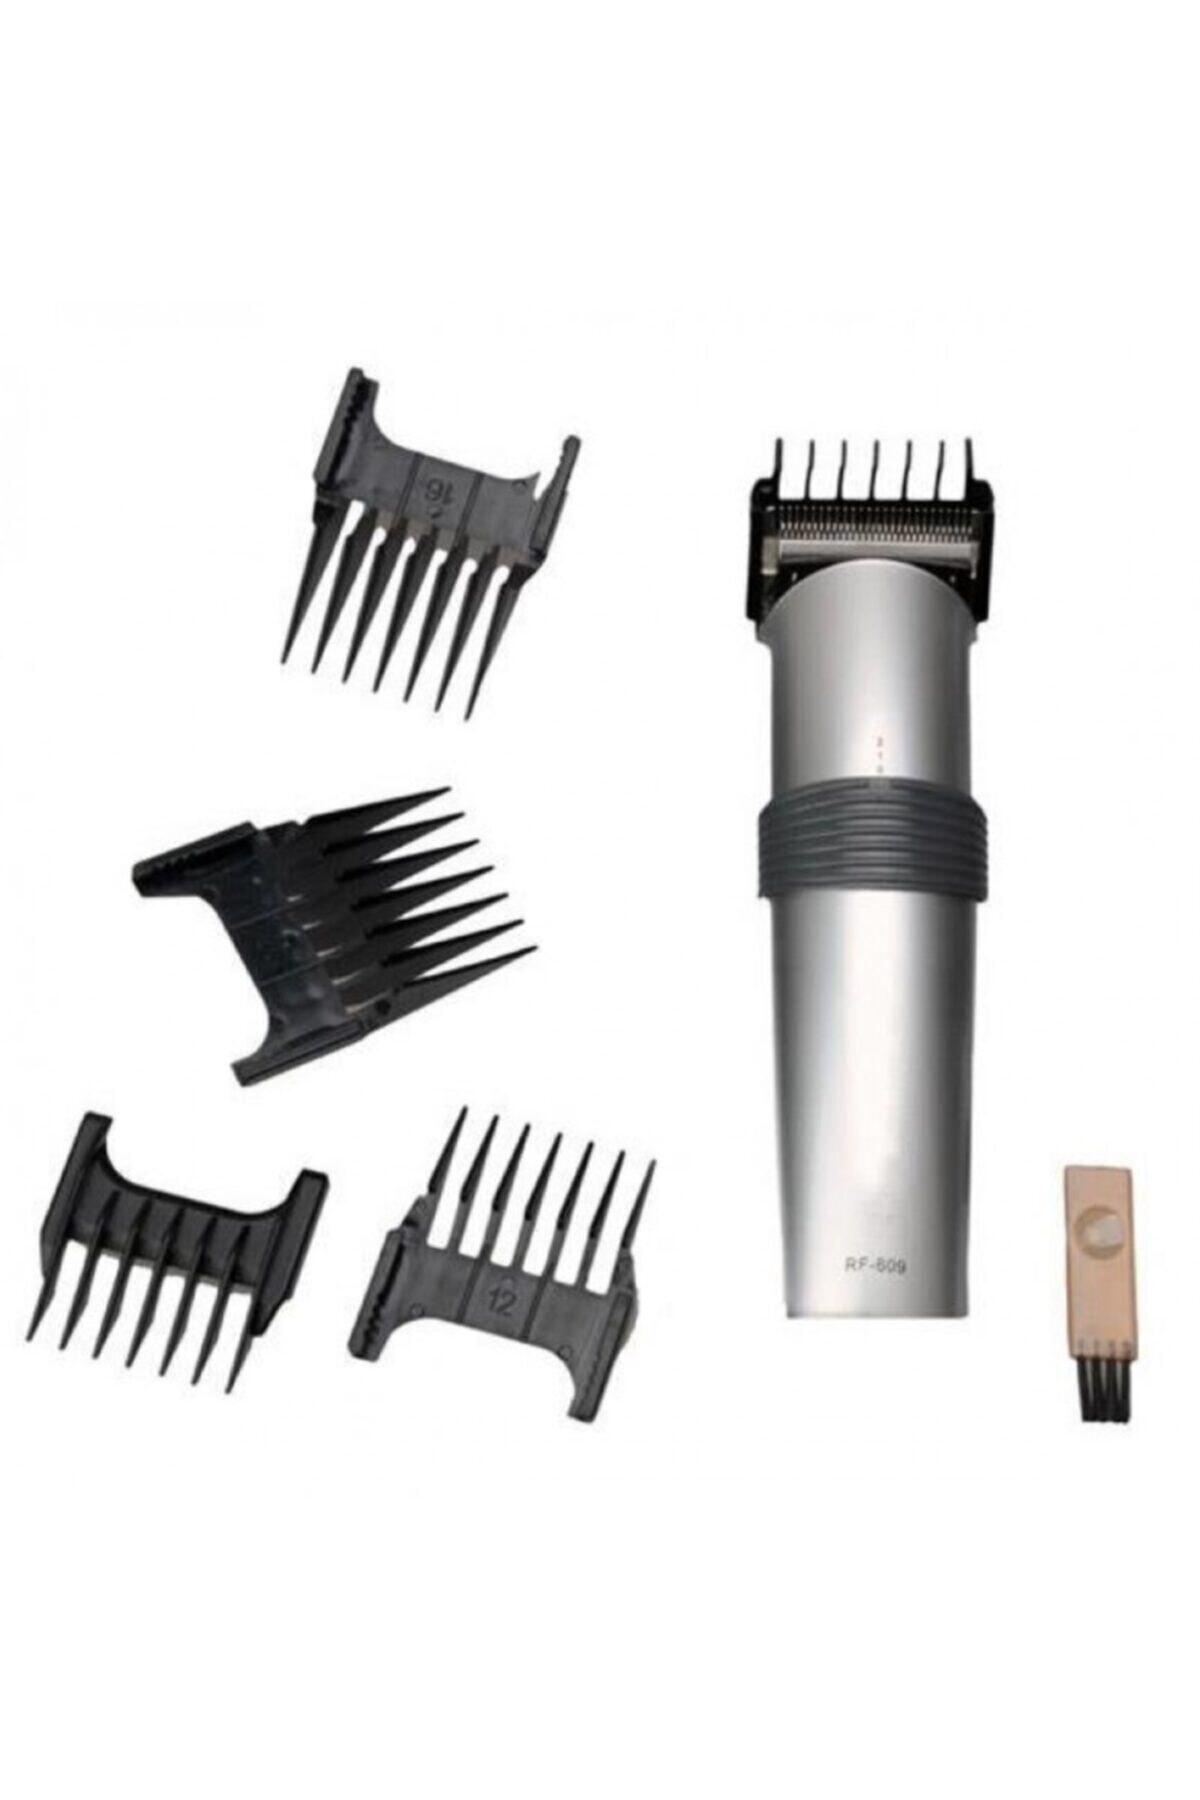 thorqtech 609 Tq-a Şarjlı Tıraş Makinesi Saç Sakal Kesme Ense Traş Makinası 1